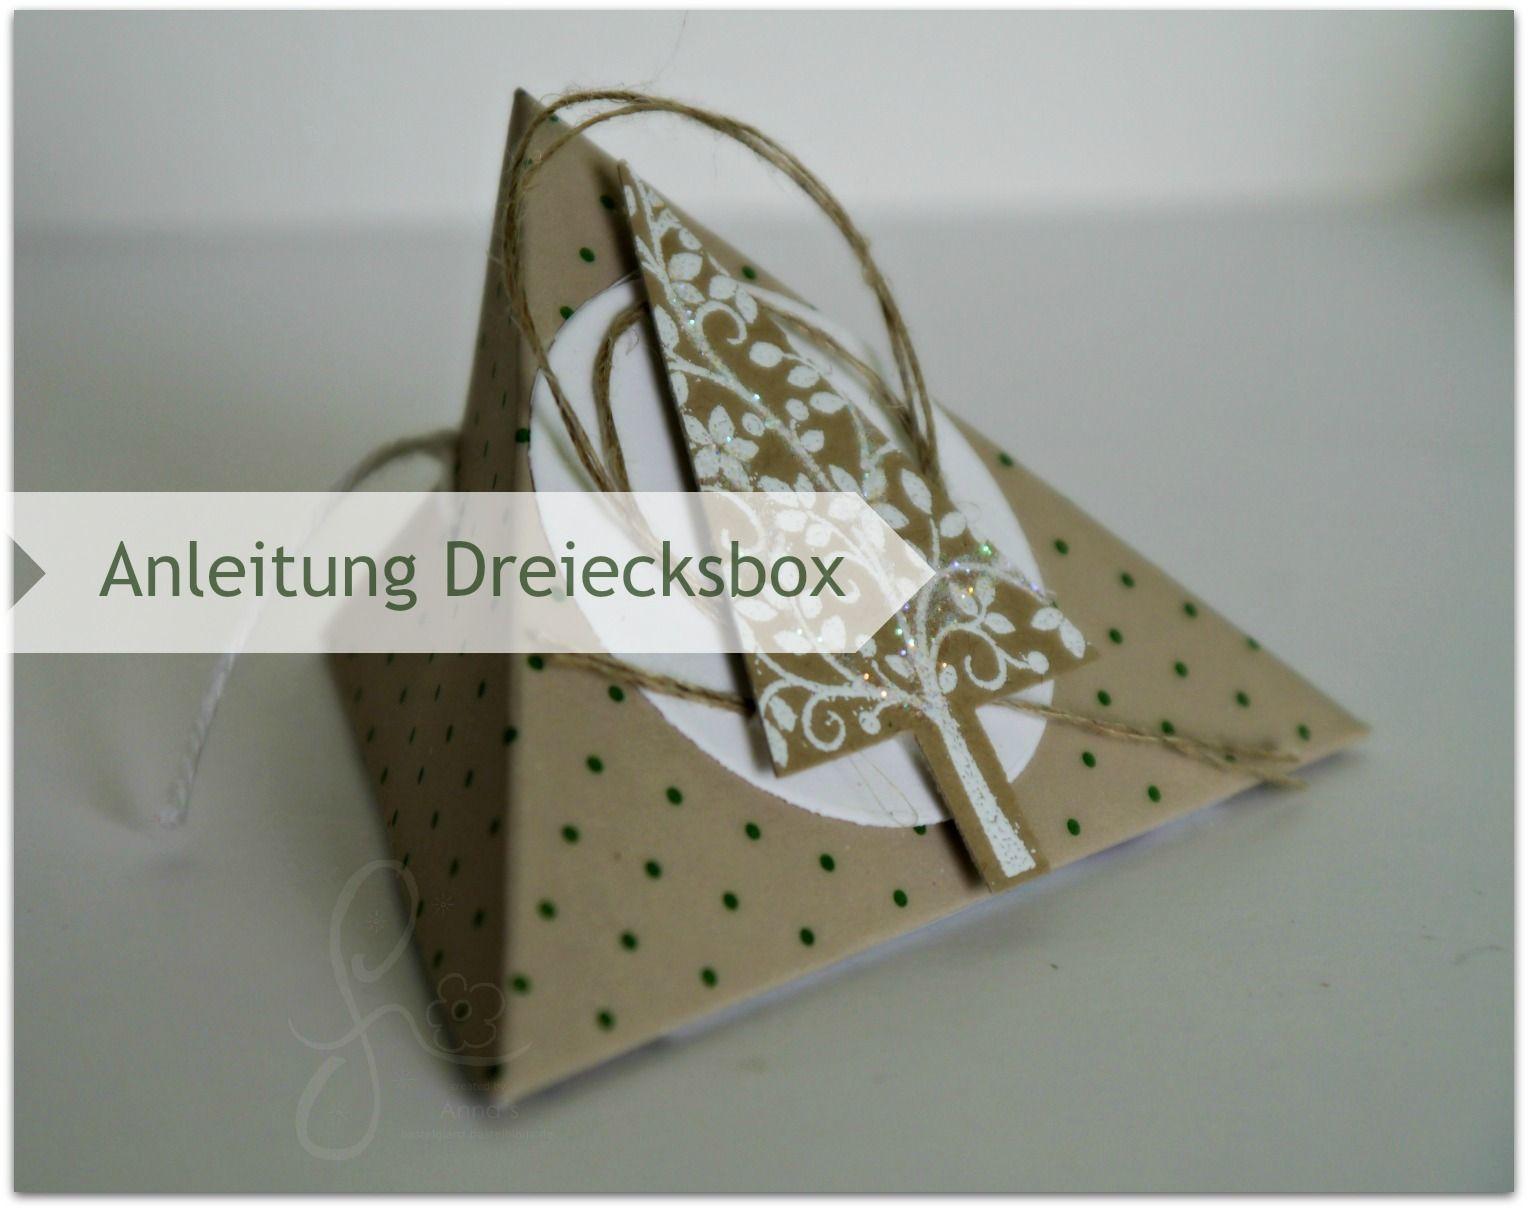 bebilderte anleitung dreiecksbox verpackungen pinterest weihnachtlich verpackt geschenke. Black Bedroom Furniture Sets. Home Design Ideas